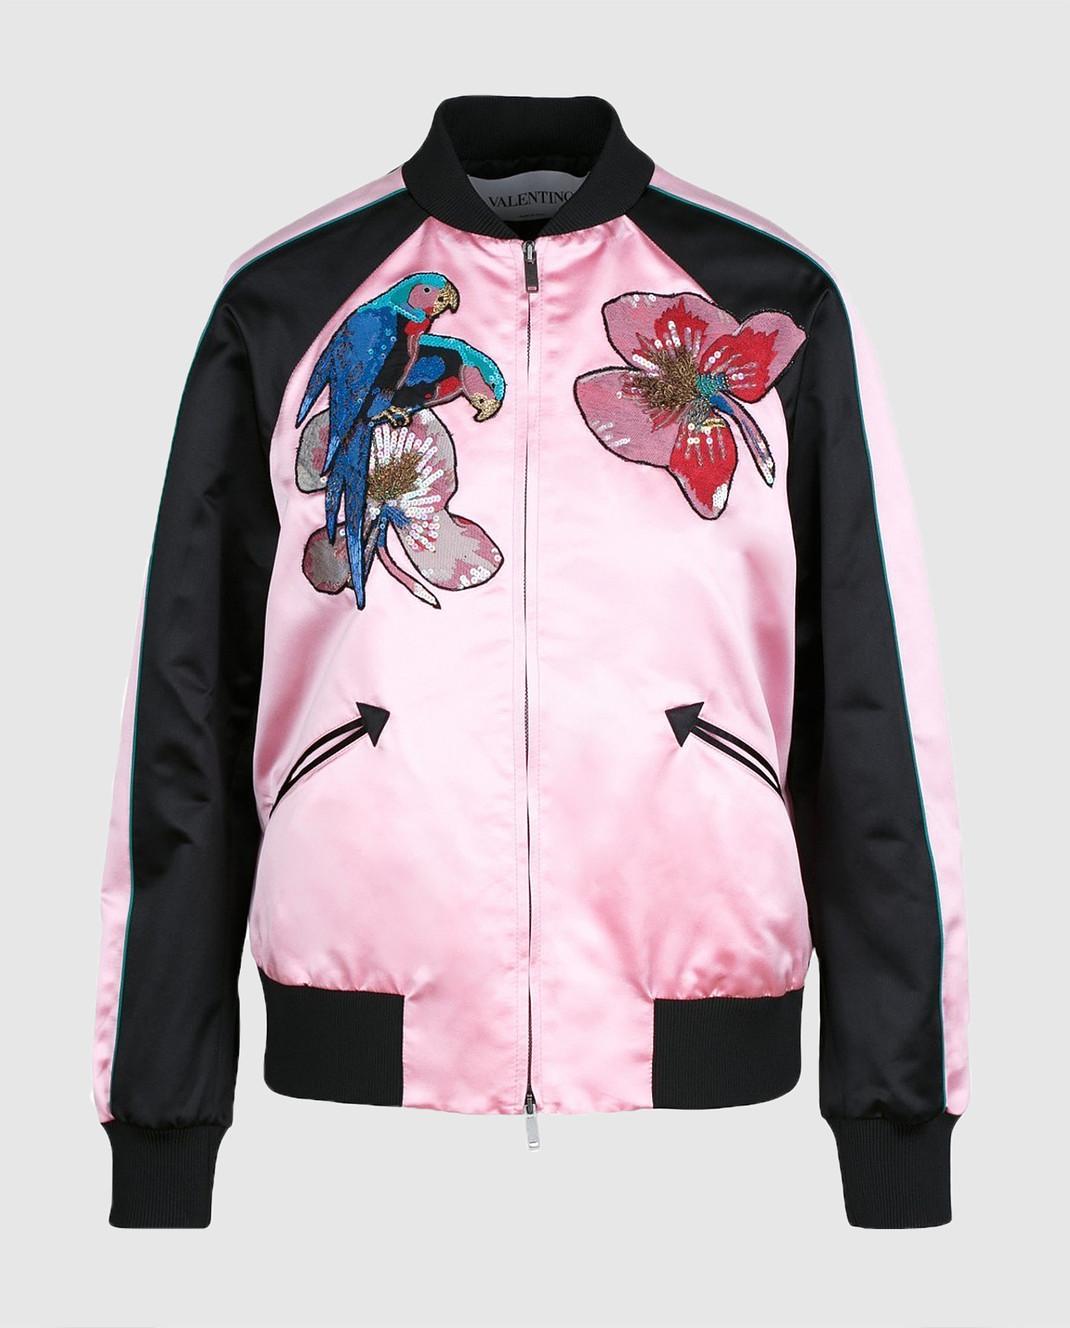 Valentino Розовый бомбер из шелка MBCCI0150HM